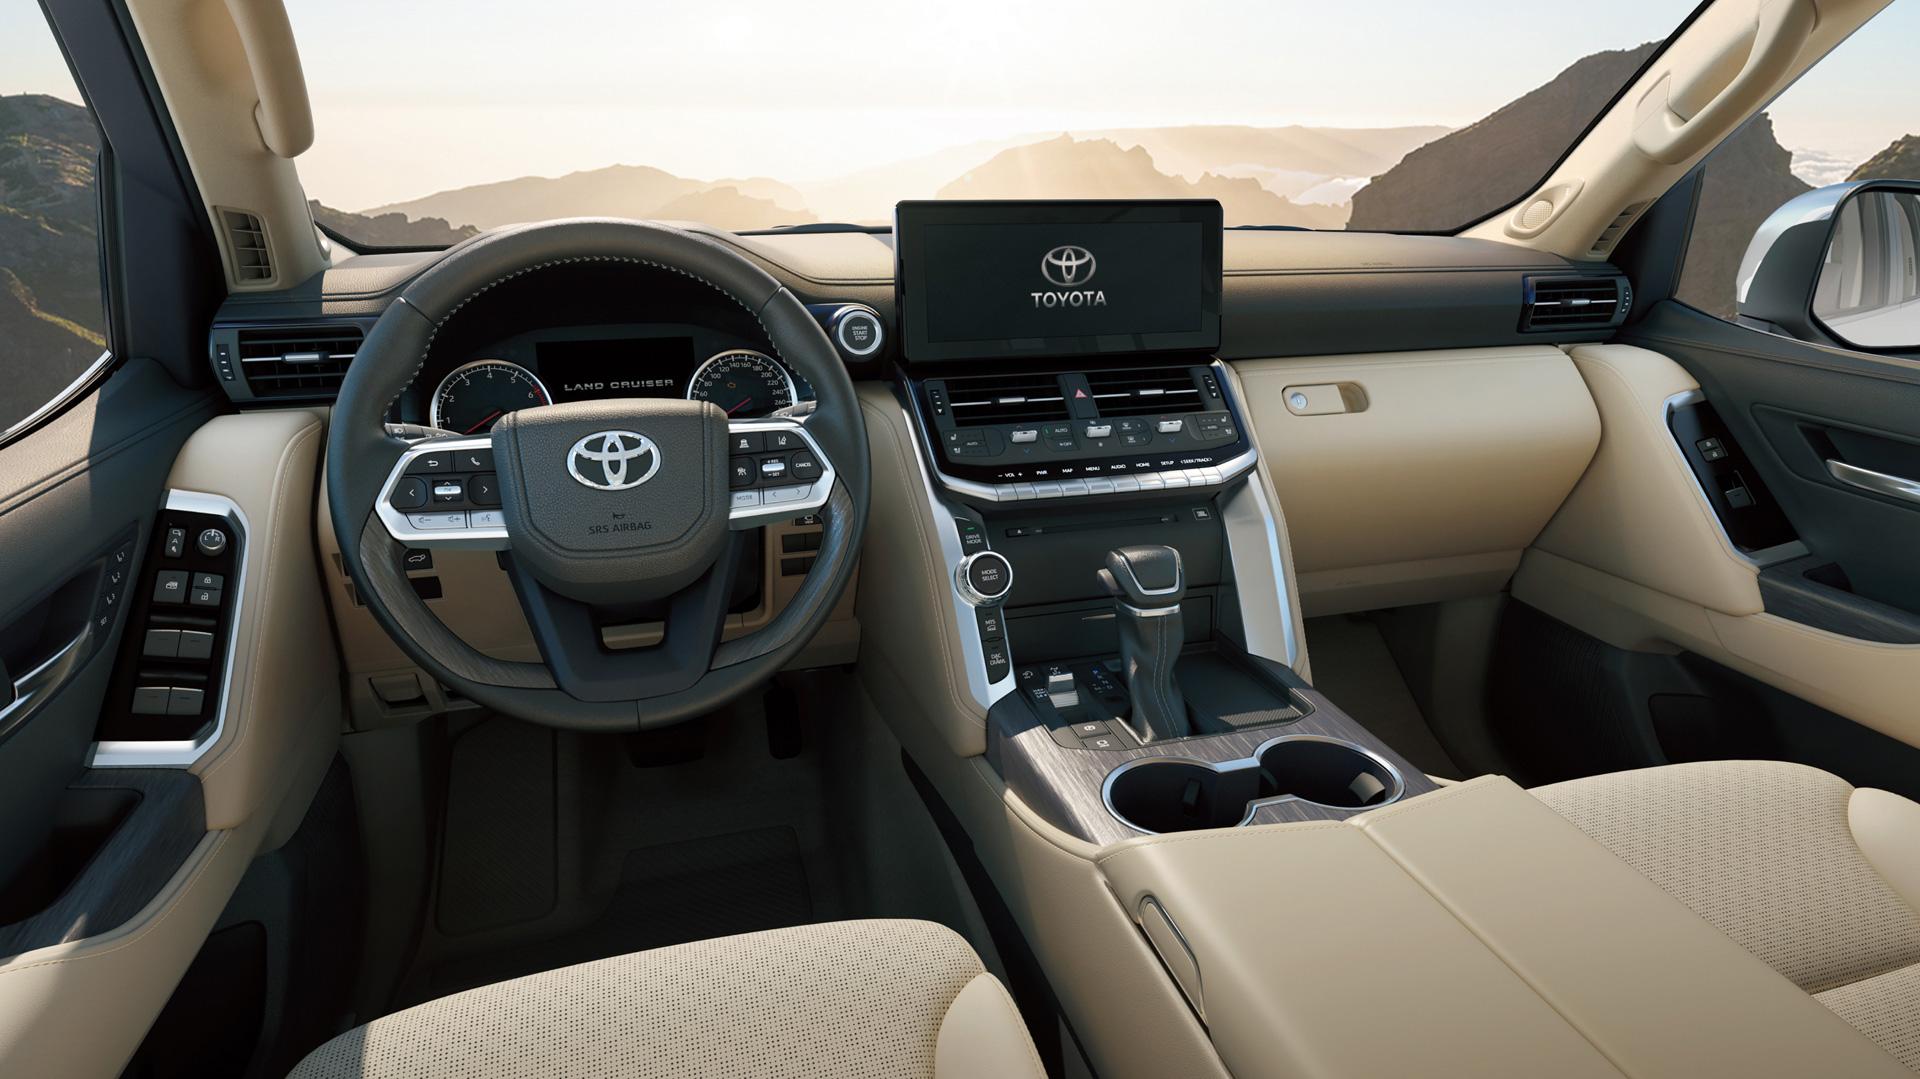 Toyota's New Land Cruiser Makes World Premiere - Image 1